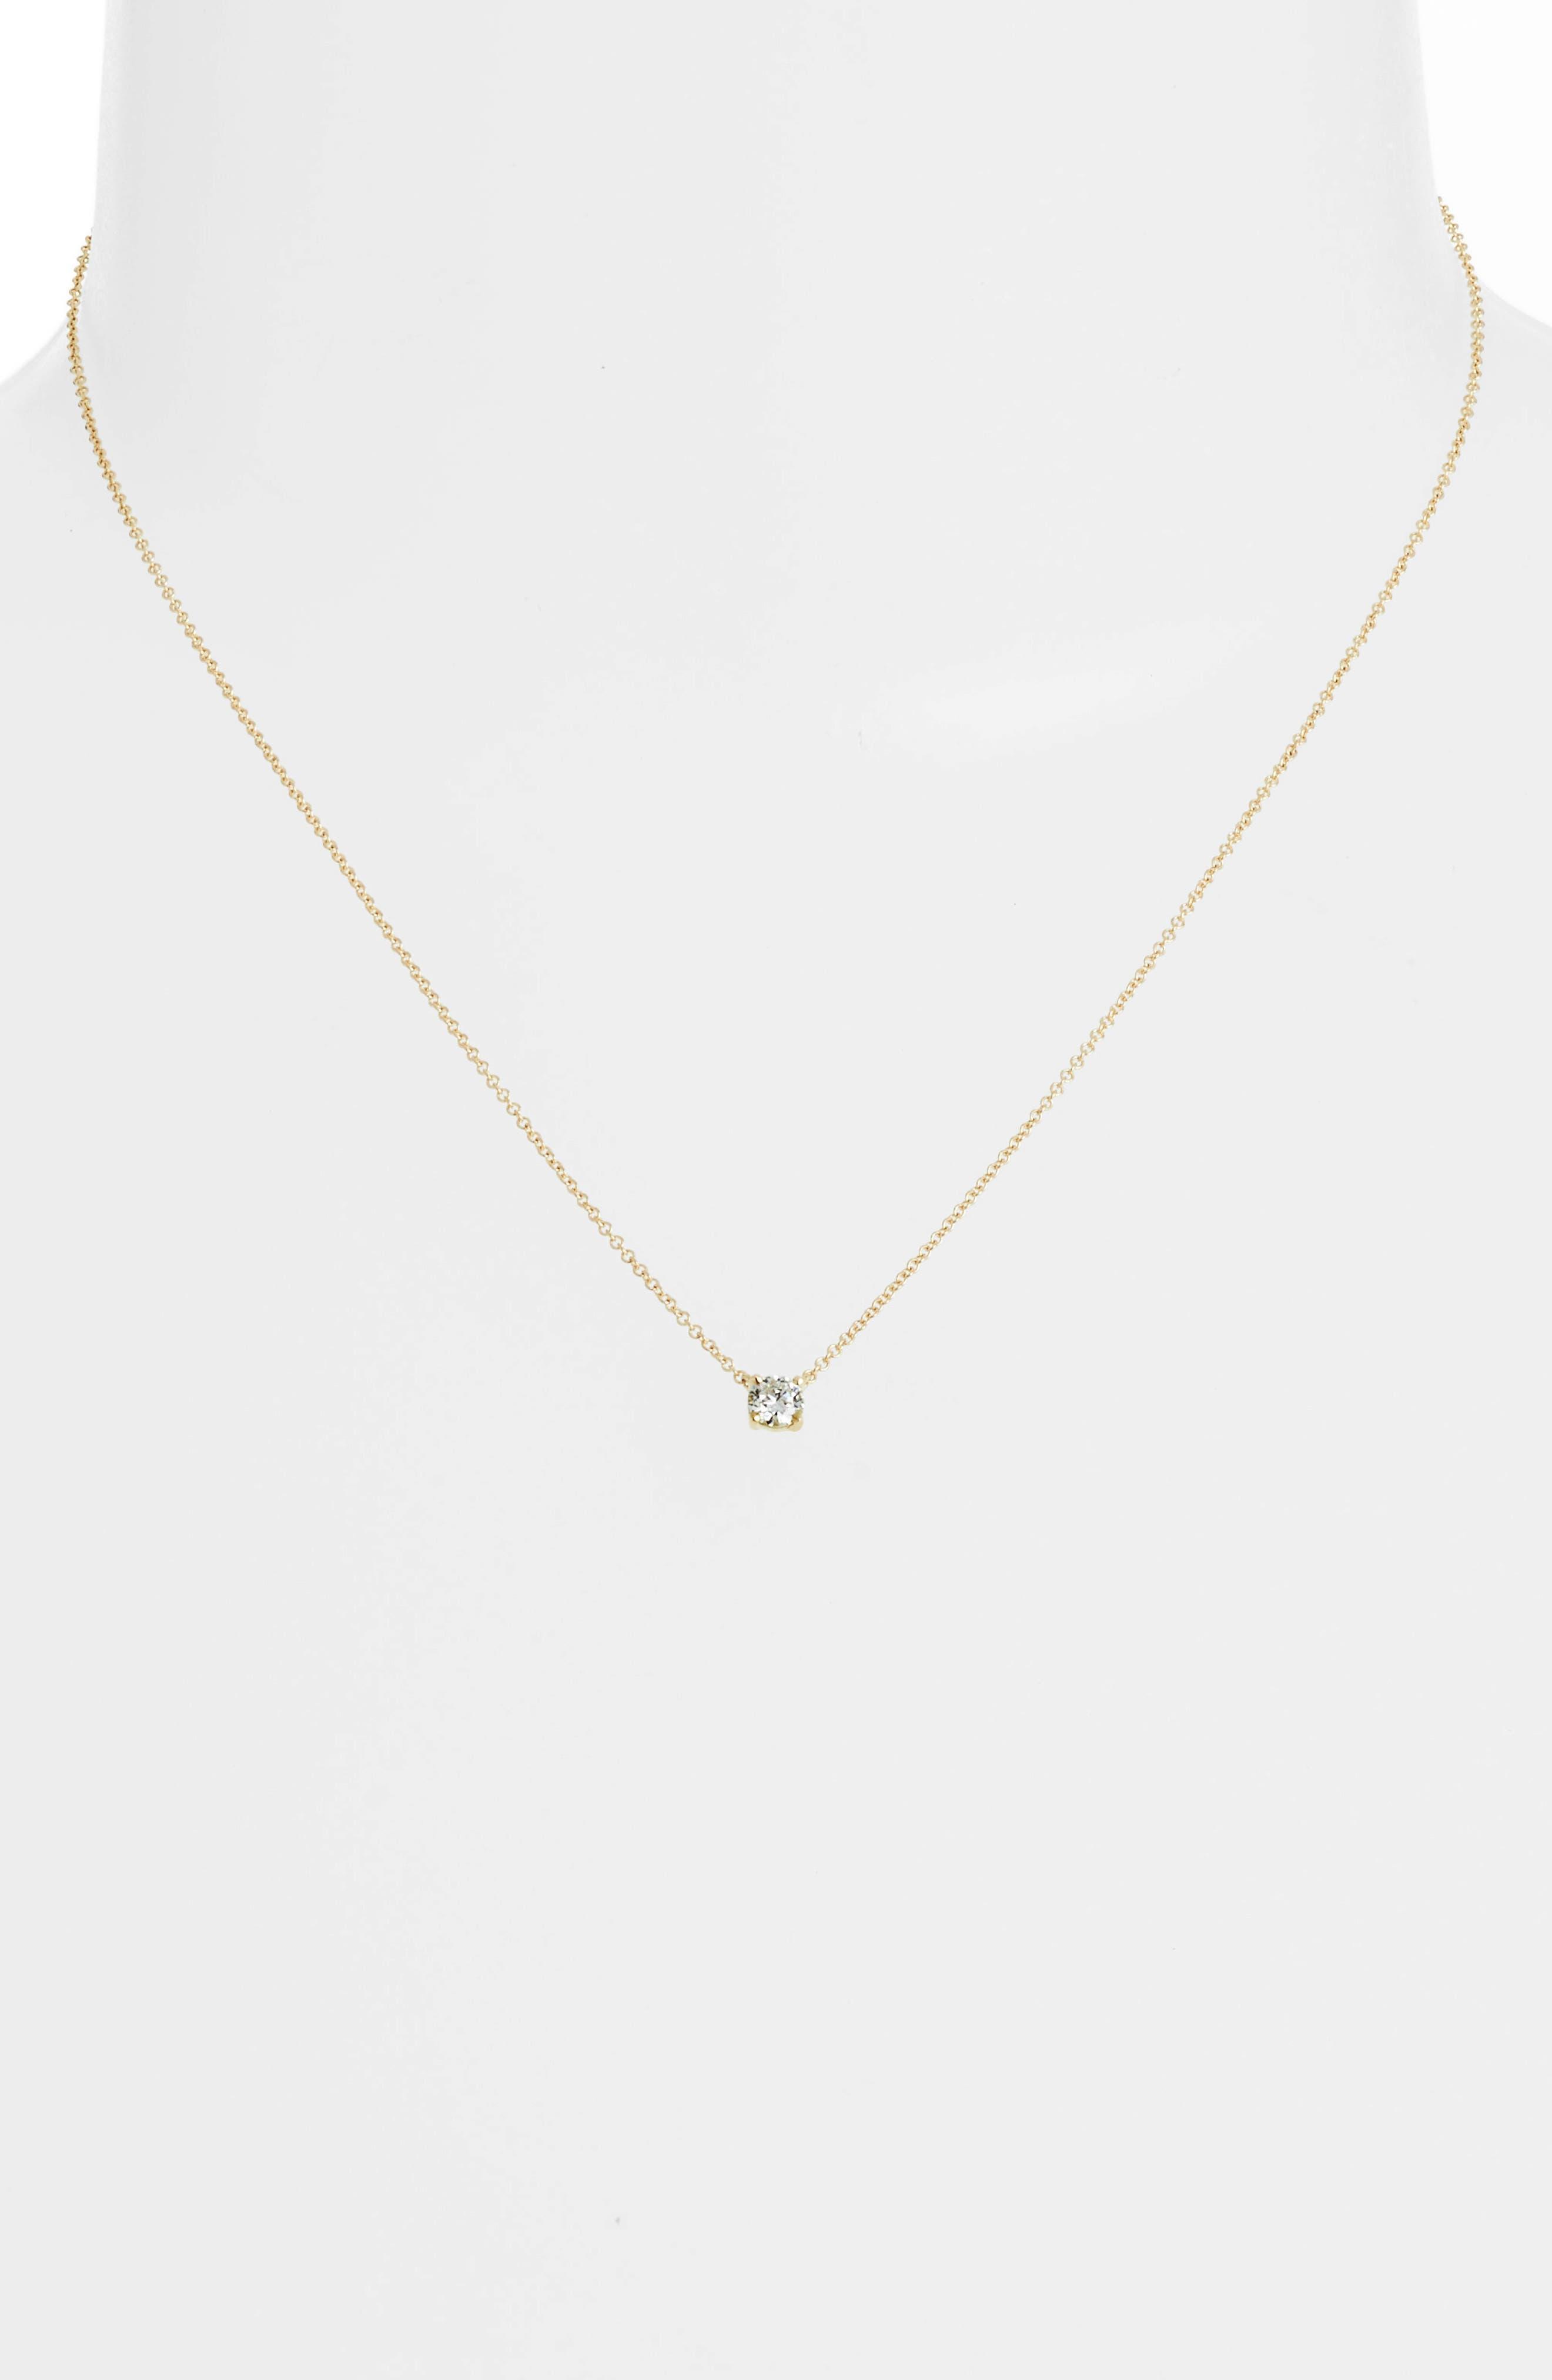 Liora Solitaire Diamond Pendant Necklace,                             Alternate thumbnail 2, color,                             Yellow Gold